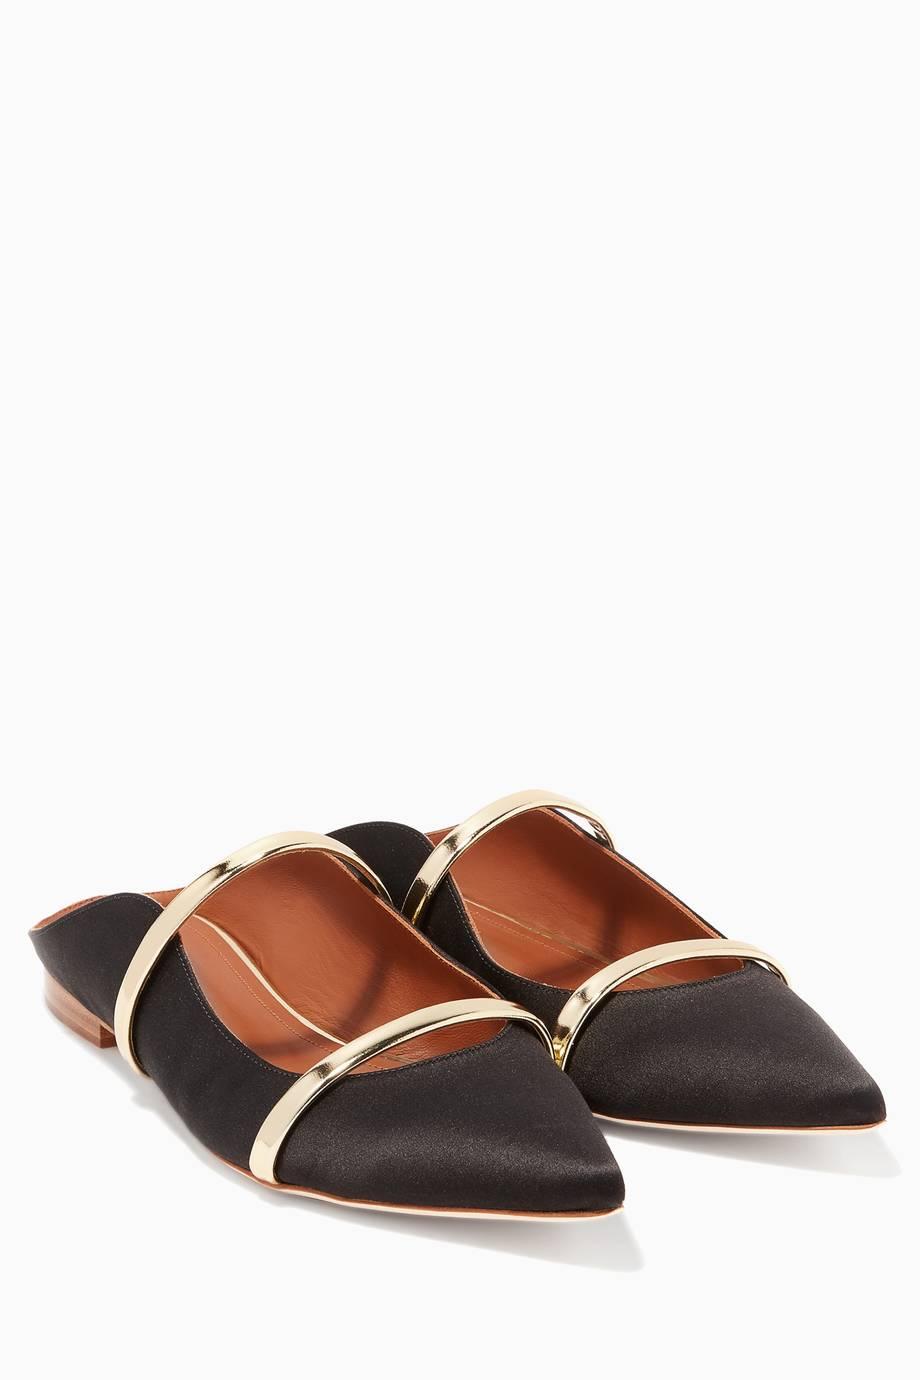 Malone Chaussures Souliers Maureen Plate - Noir NRstFM5hG1